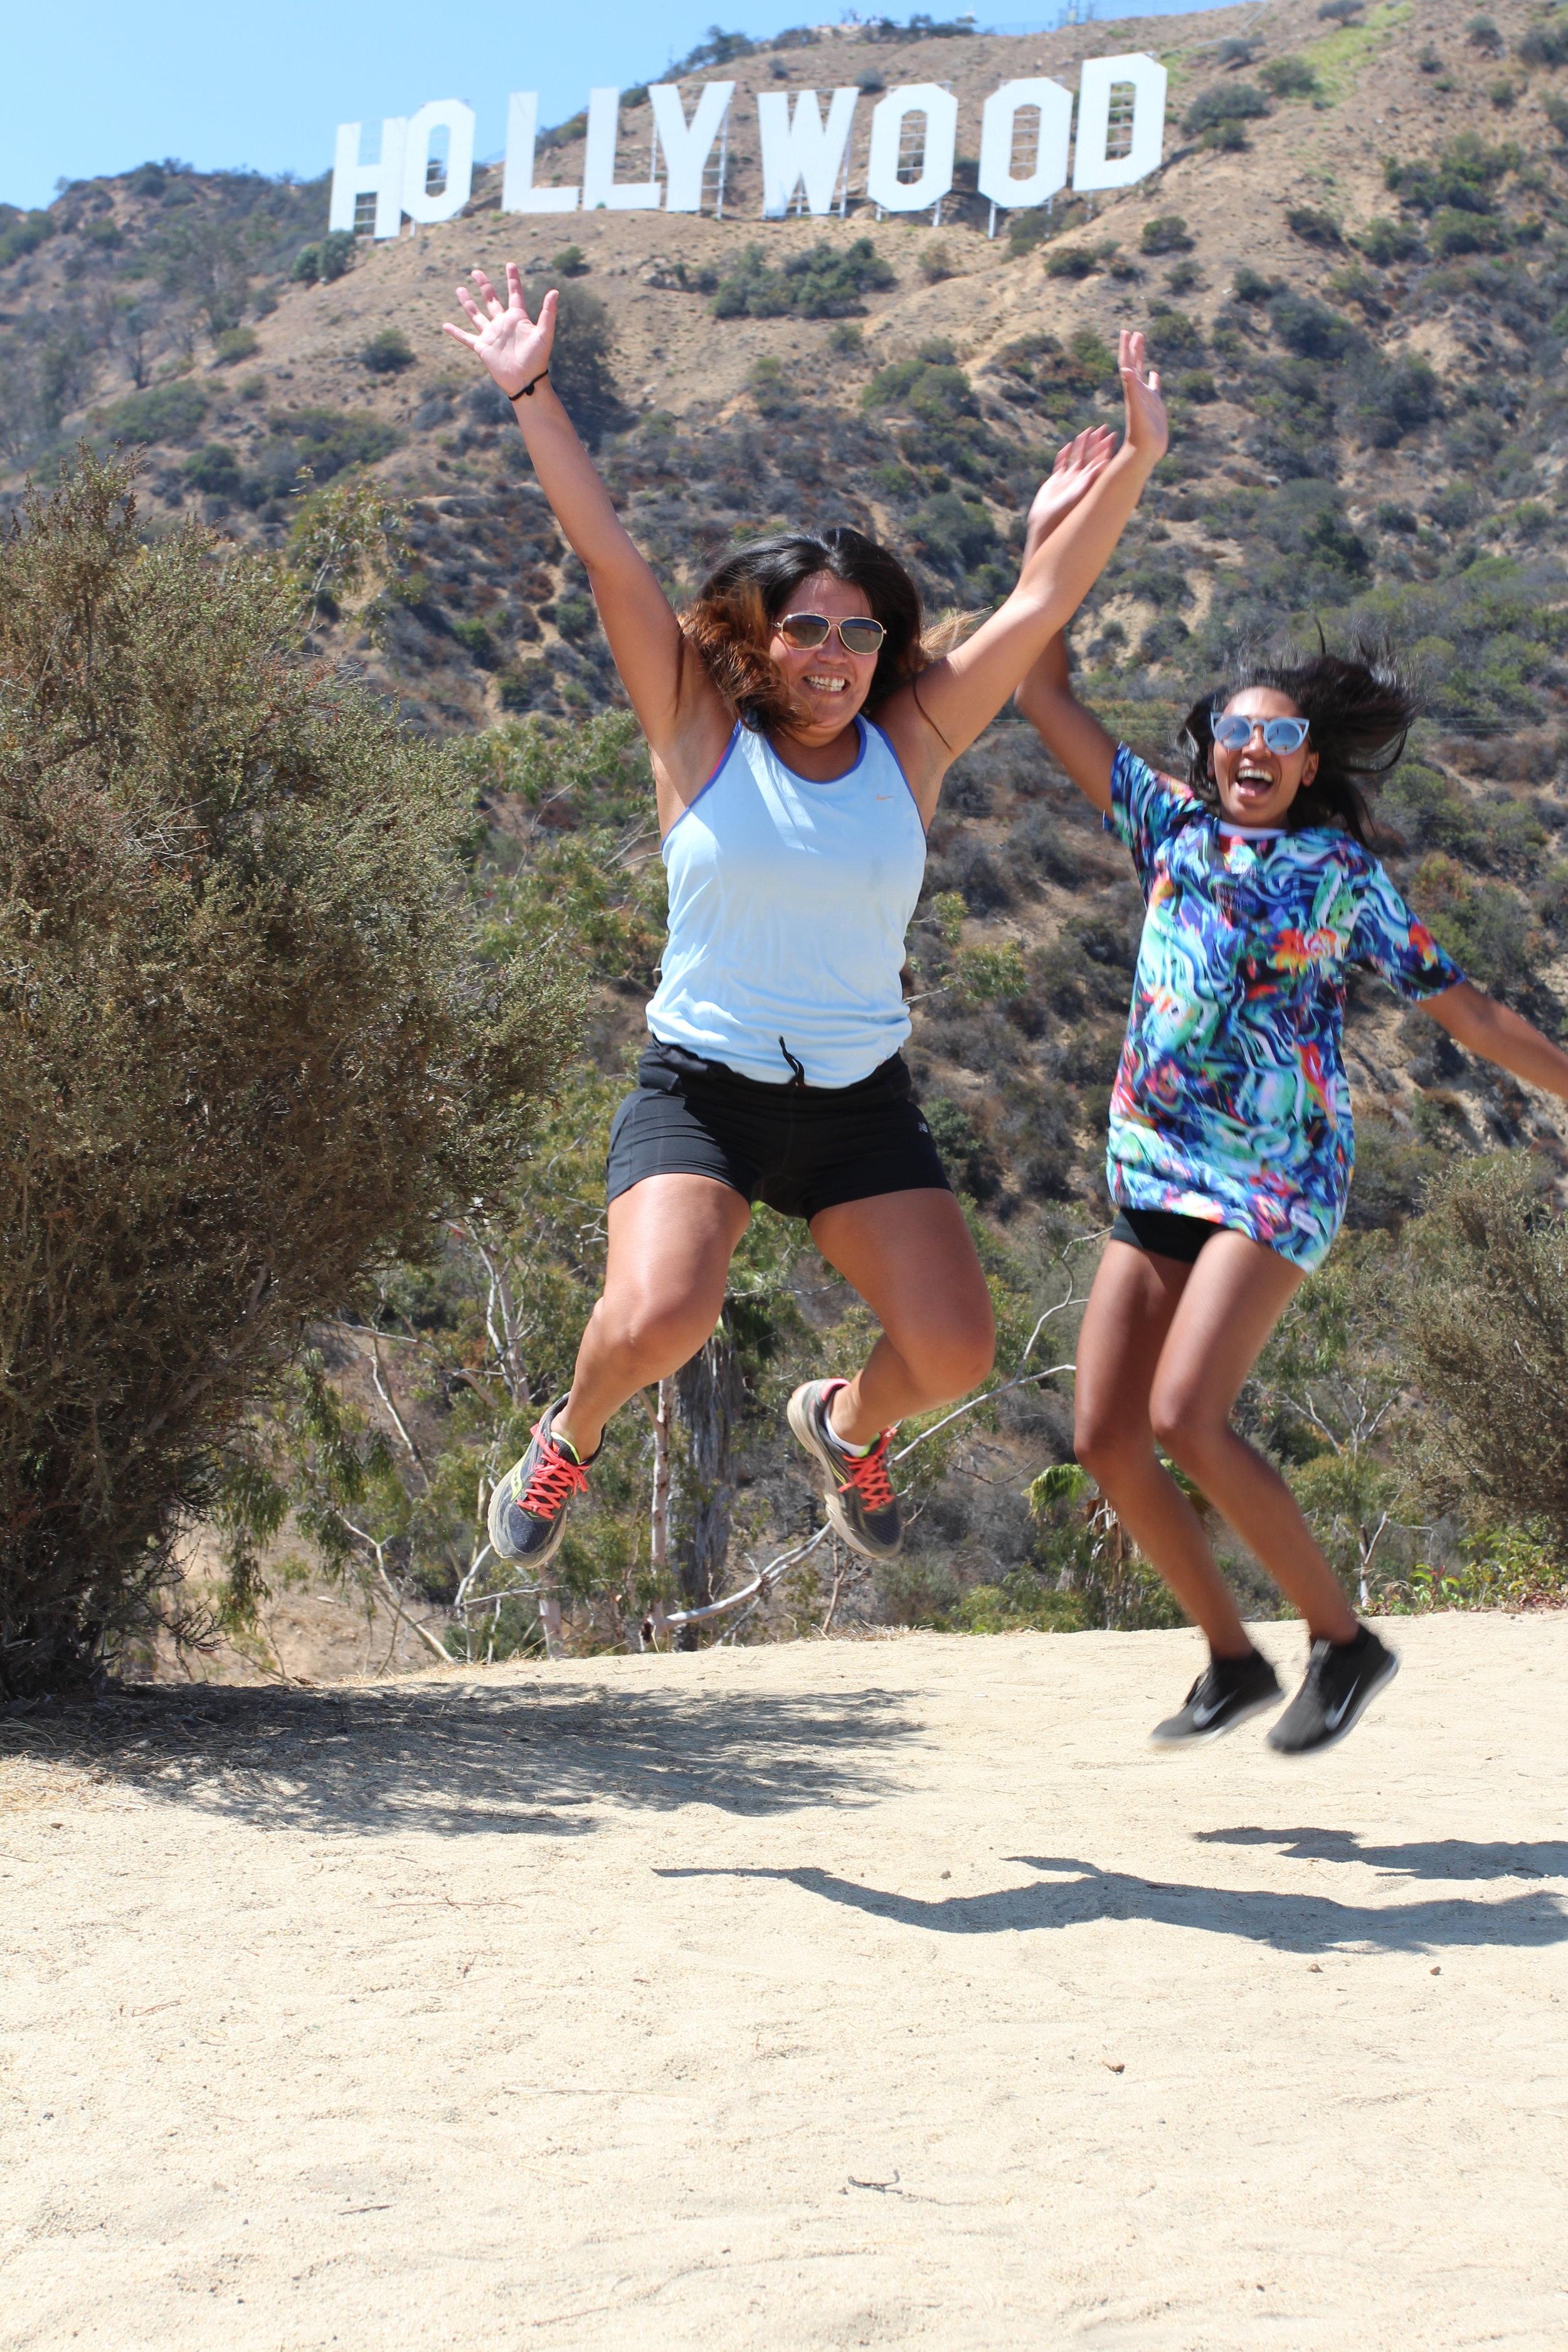 kibsta-los-angeles-blog-her-2016-kim-kardashian-west